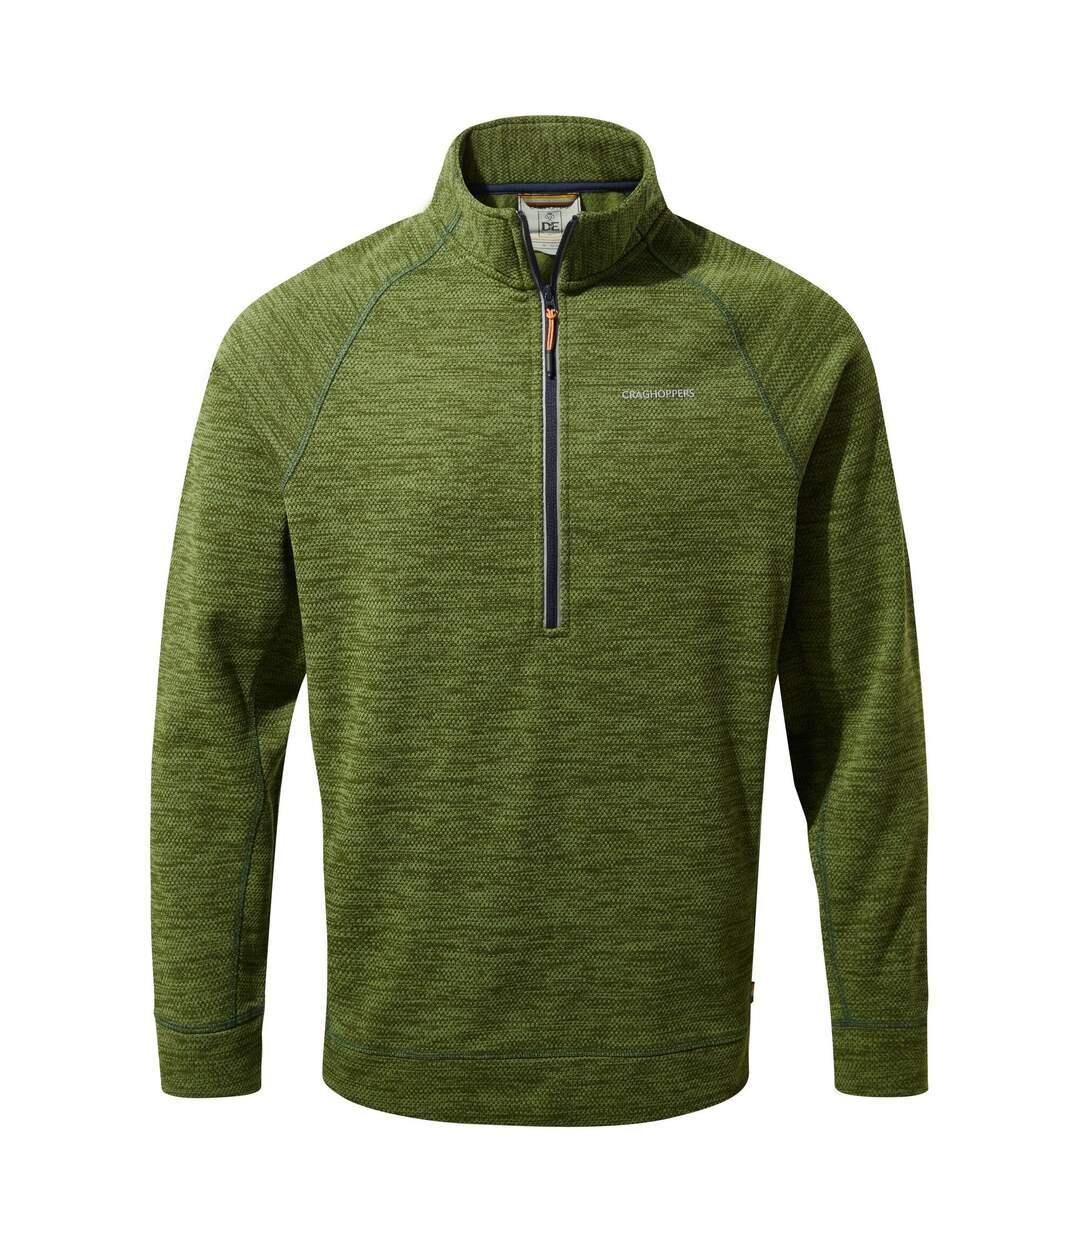 Craghoppers Mens Stromer Half Zip Fleece (Agave Green) - UTCG1325